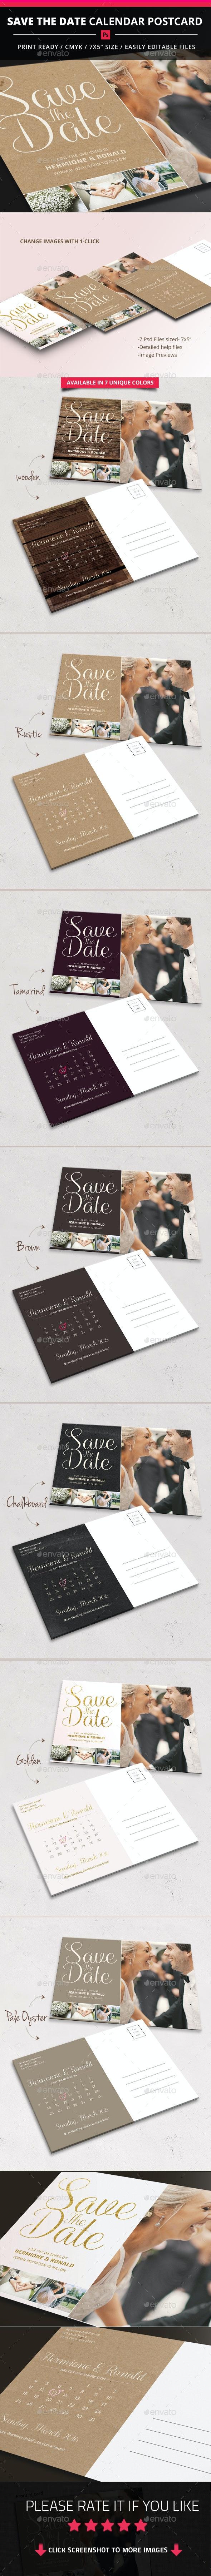 Save The Date Calendar Postcard - Weddings Cards & Invites